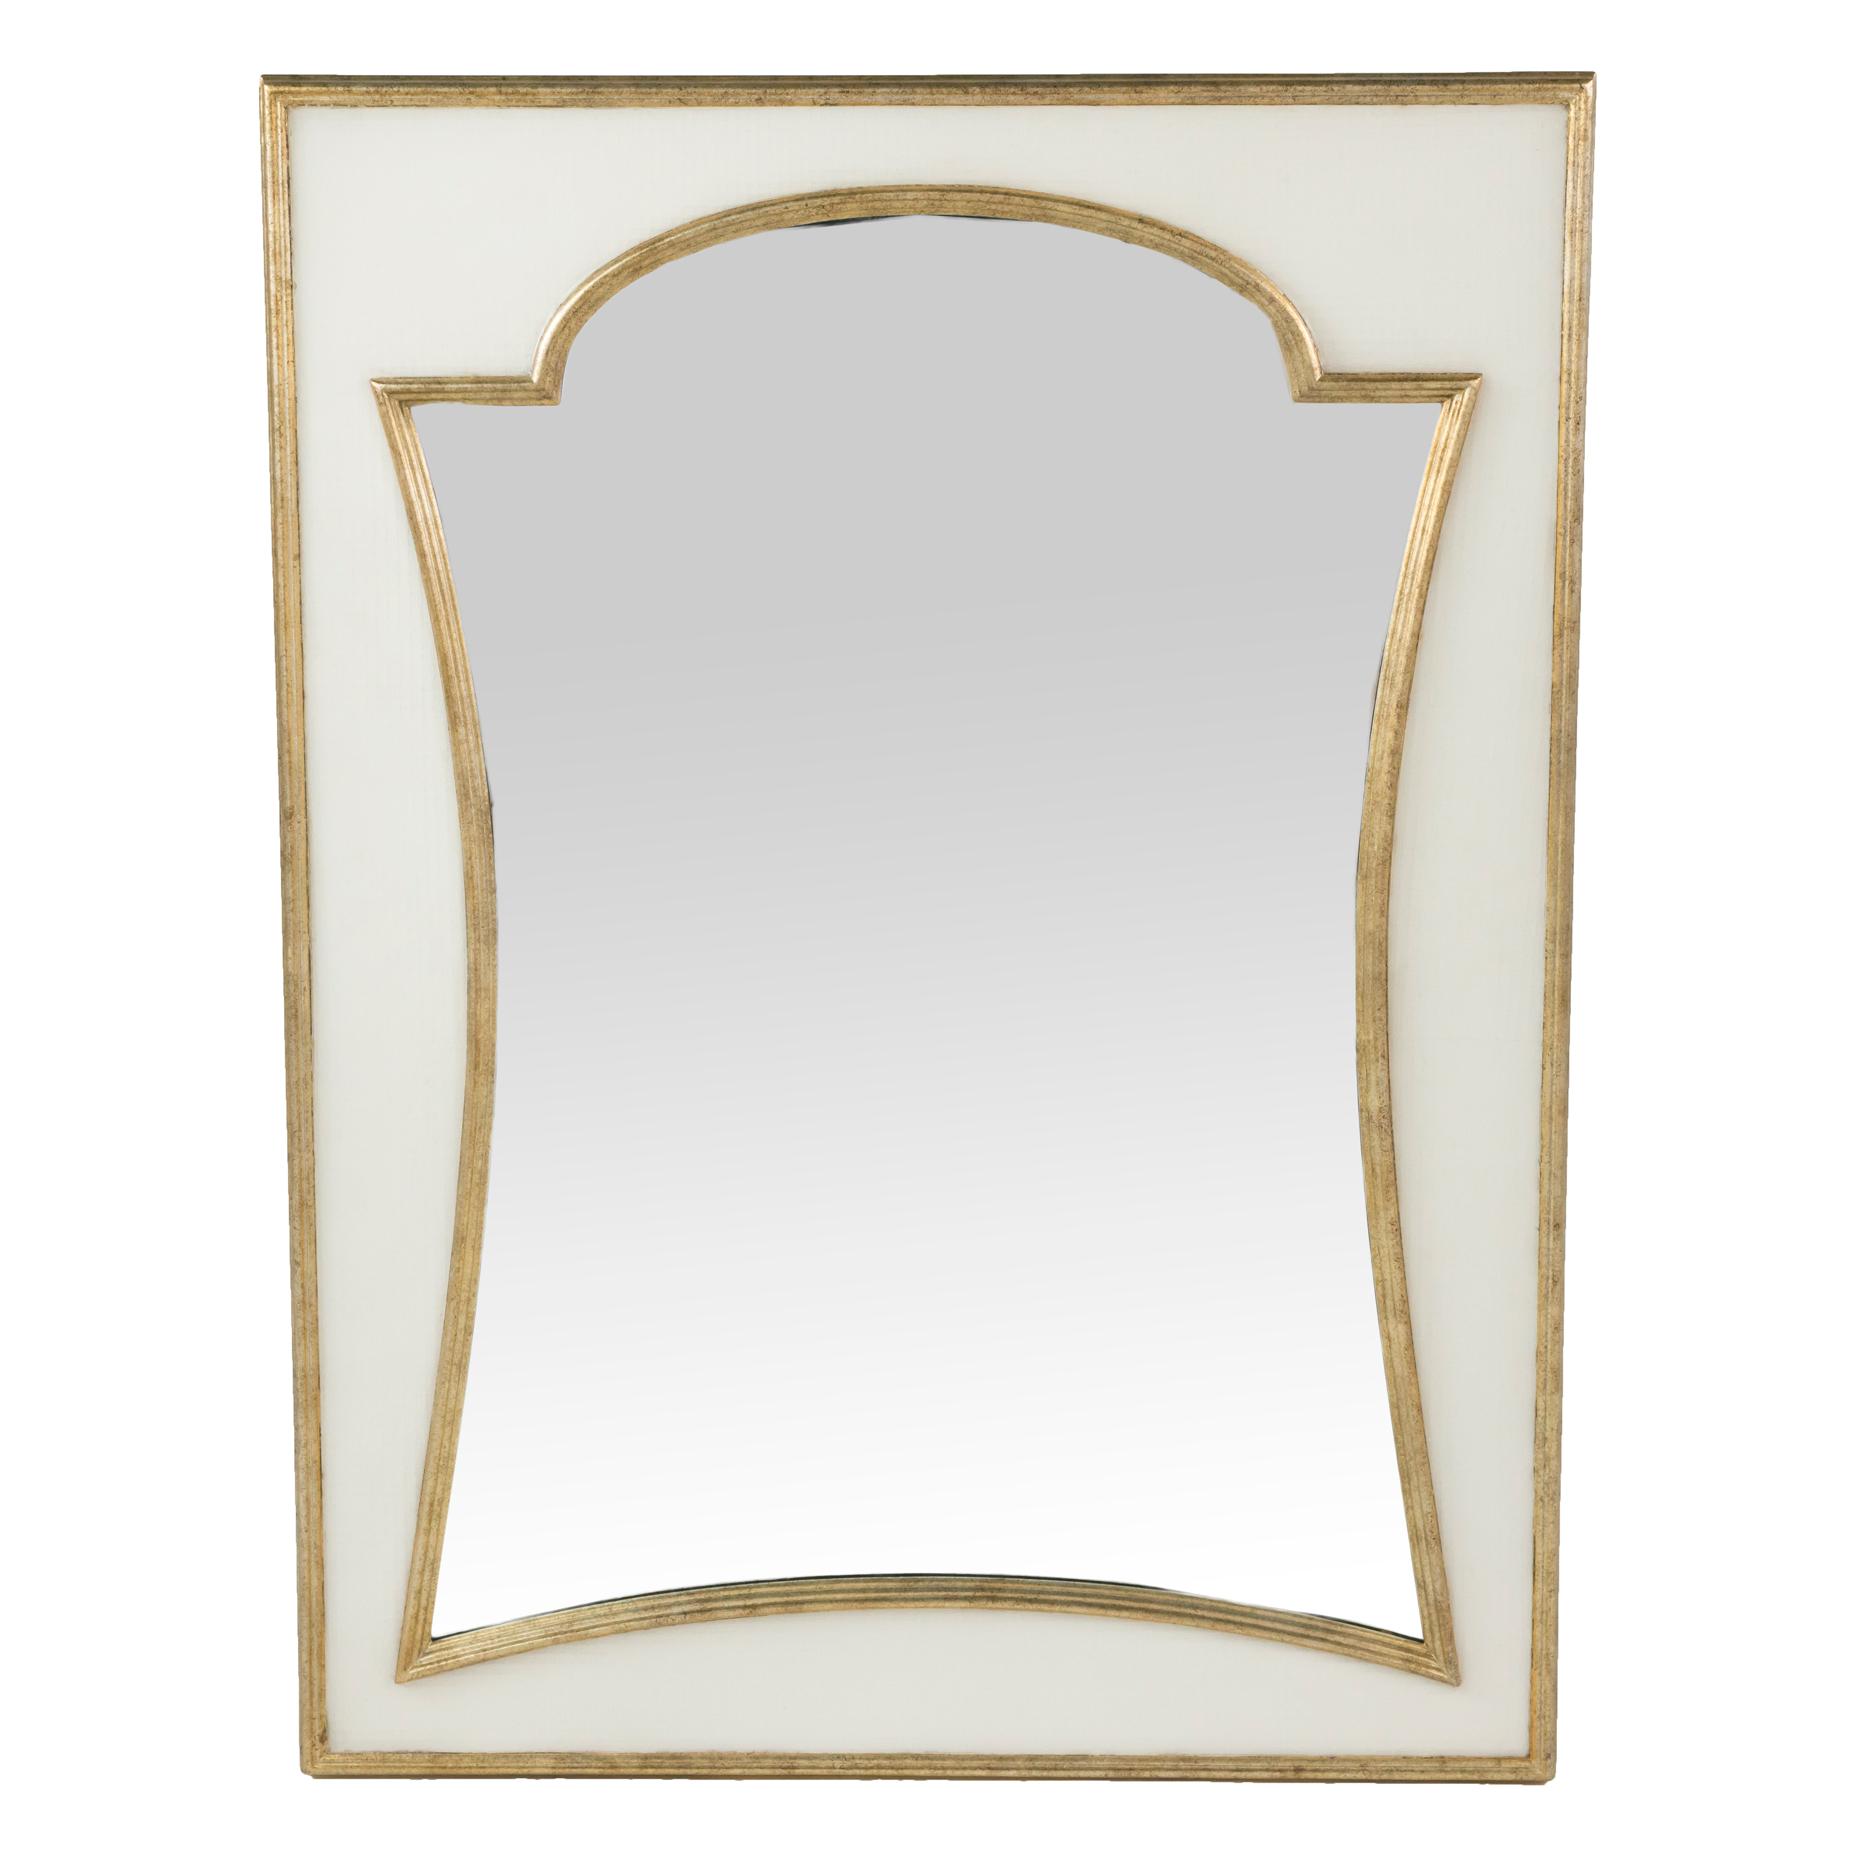 Regency Champagne Seagrass Mirror